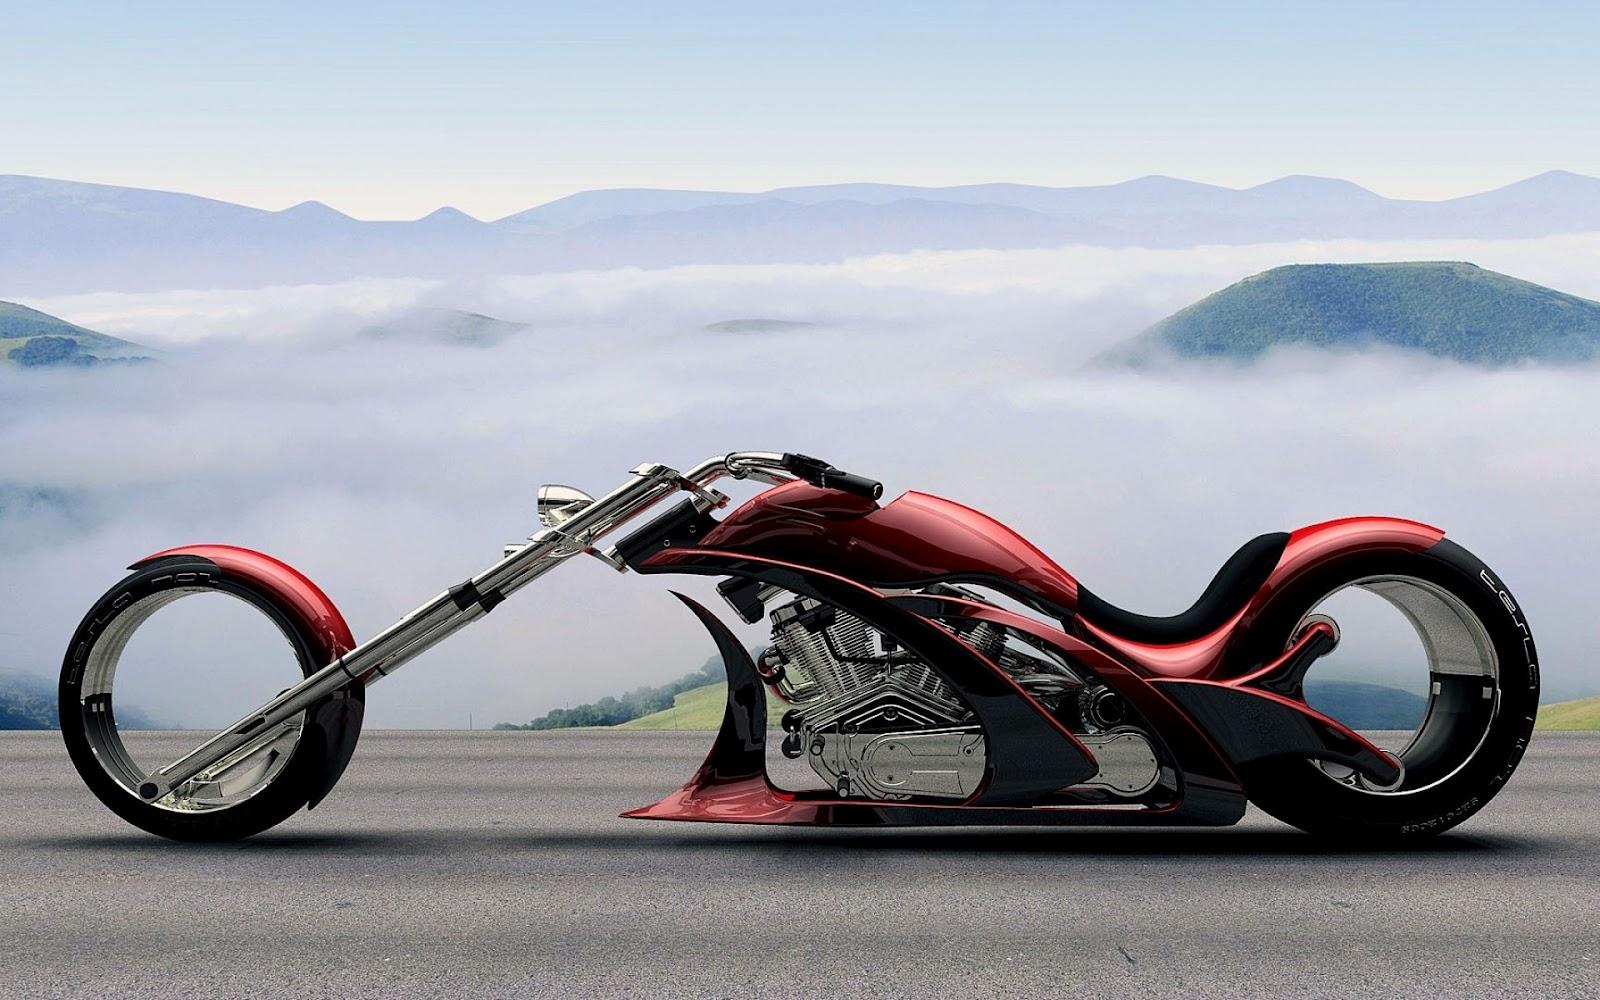 lamborghini concept flavio adriani awesome futuristic bike